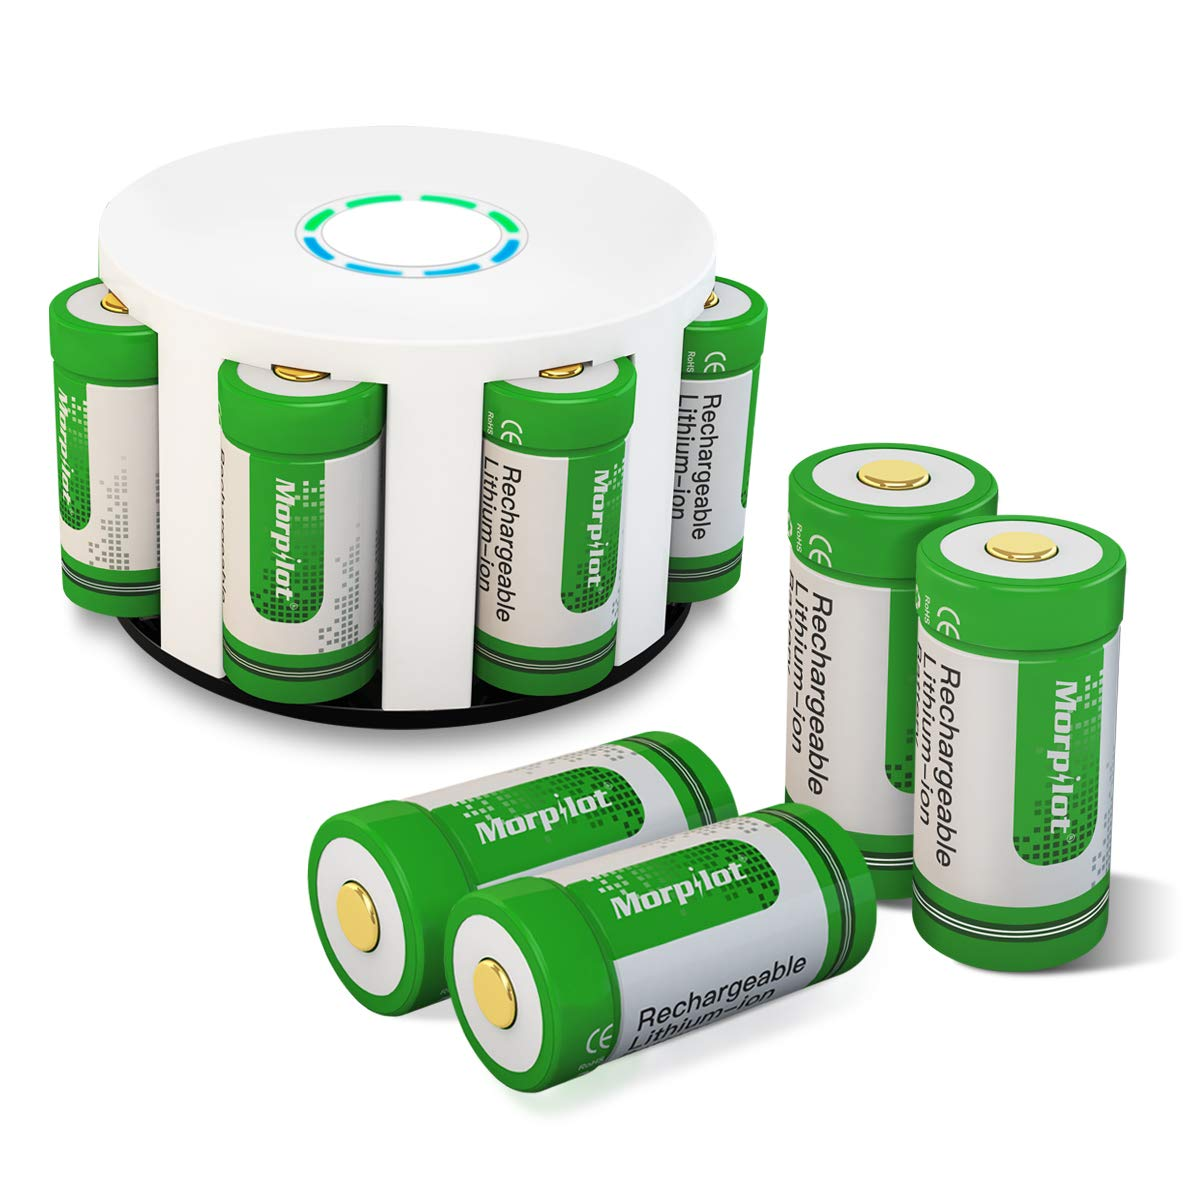 Morpilot RCR123A Batteria, CR123A Ricaricabile 3.7V 700mAh 8PCS per Fotocamera Arlo, Caricare 500 Volte Riutilizzabile, Professionale per Fotocamera Arlo VMS3030/3130/3230/3330/3430